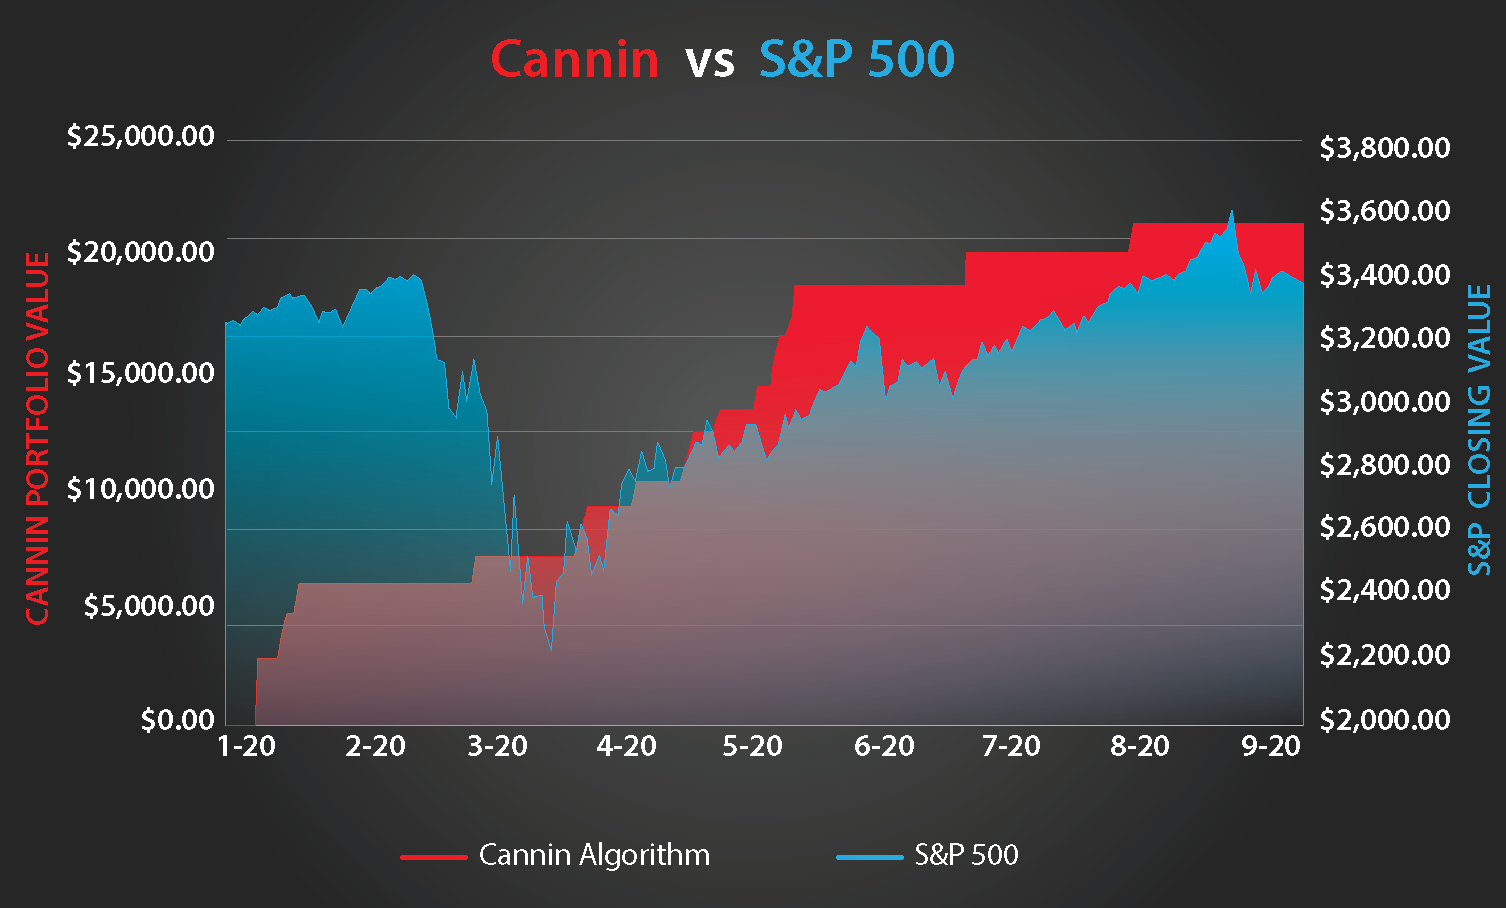 Hemp Stocks Algorithmic Stock Trades S&P 500 Vs Cannin.com